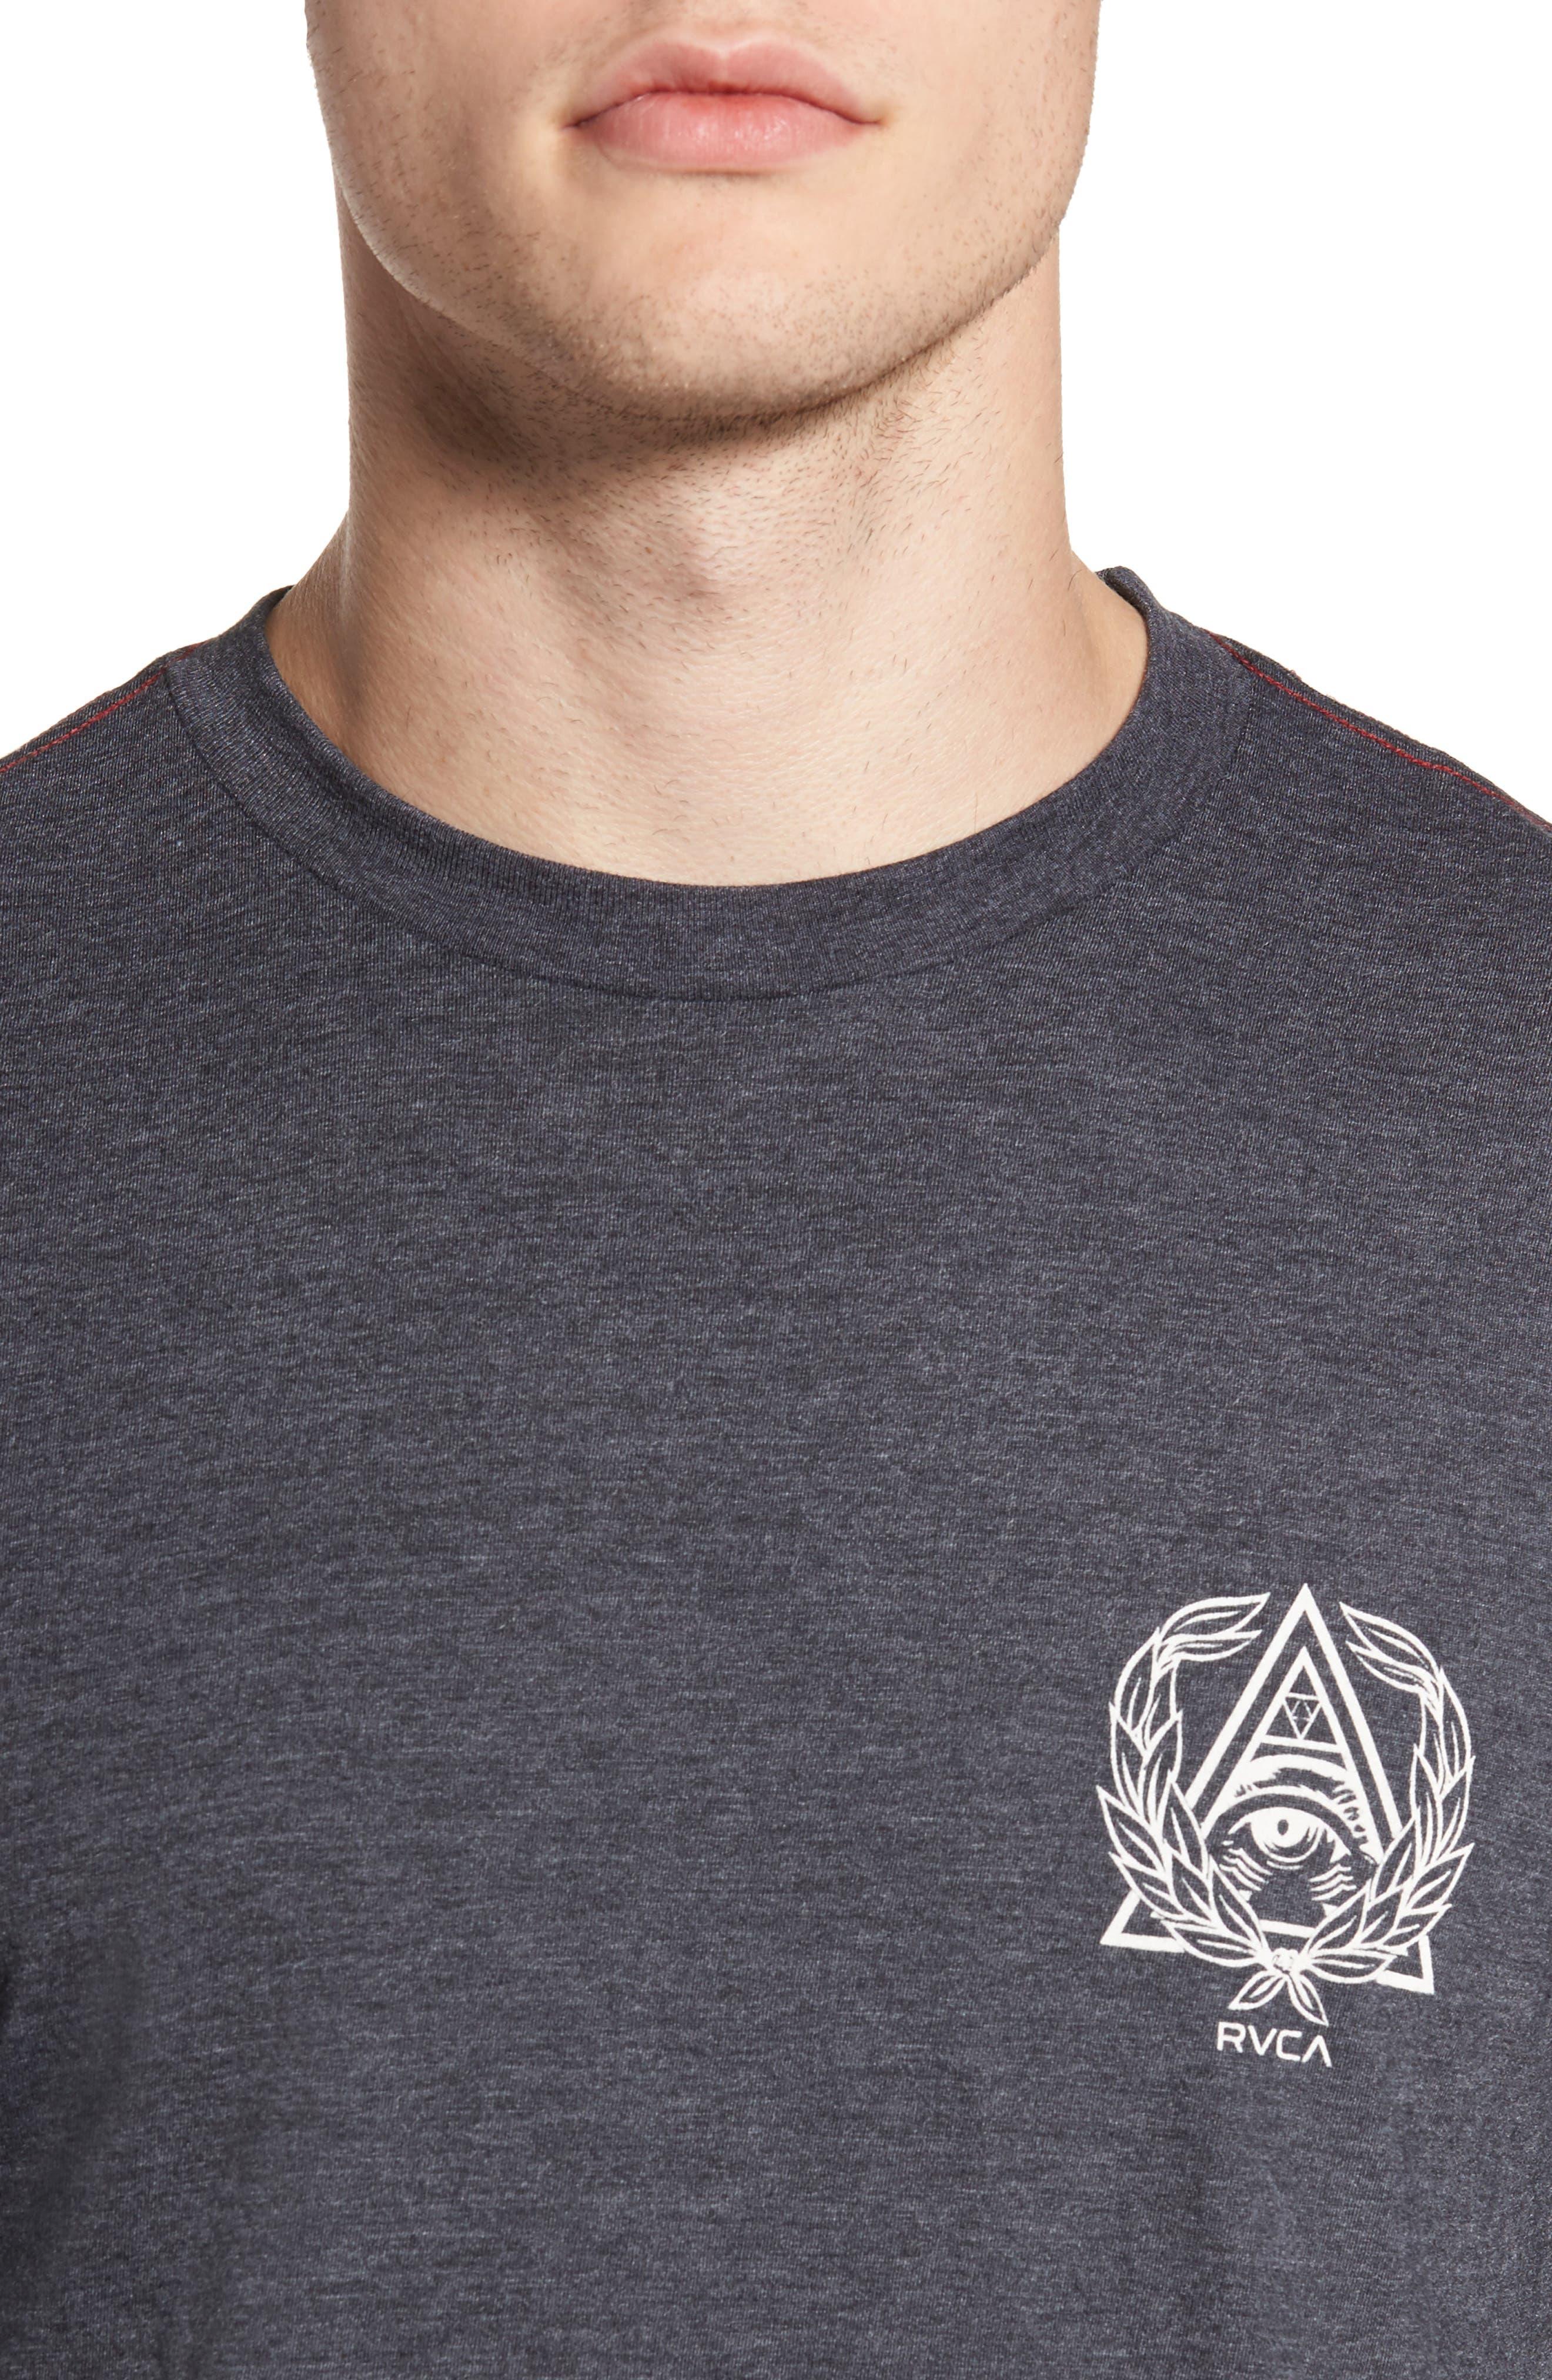 Prigus Sport Team T-Shirt,                             Alternate thumbnail 4, color,                             001